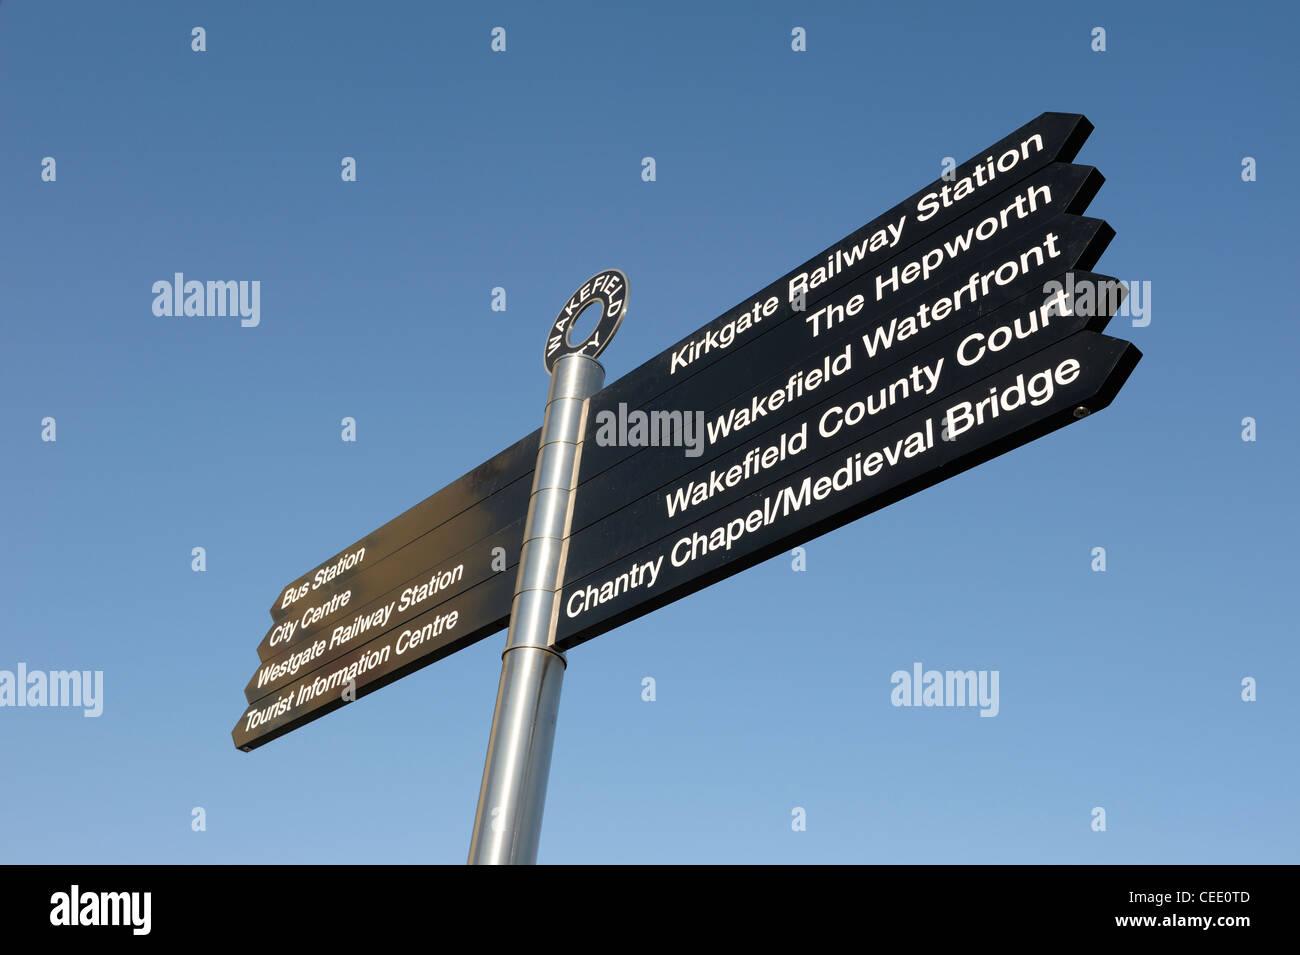 Wakefield city centre landmark sign Stock Photo